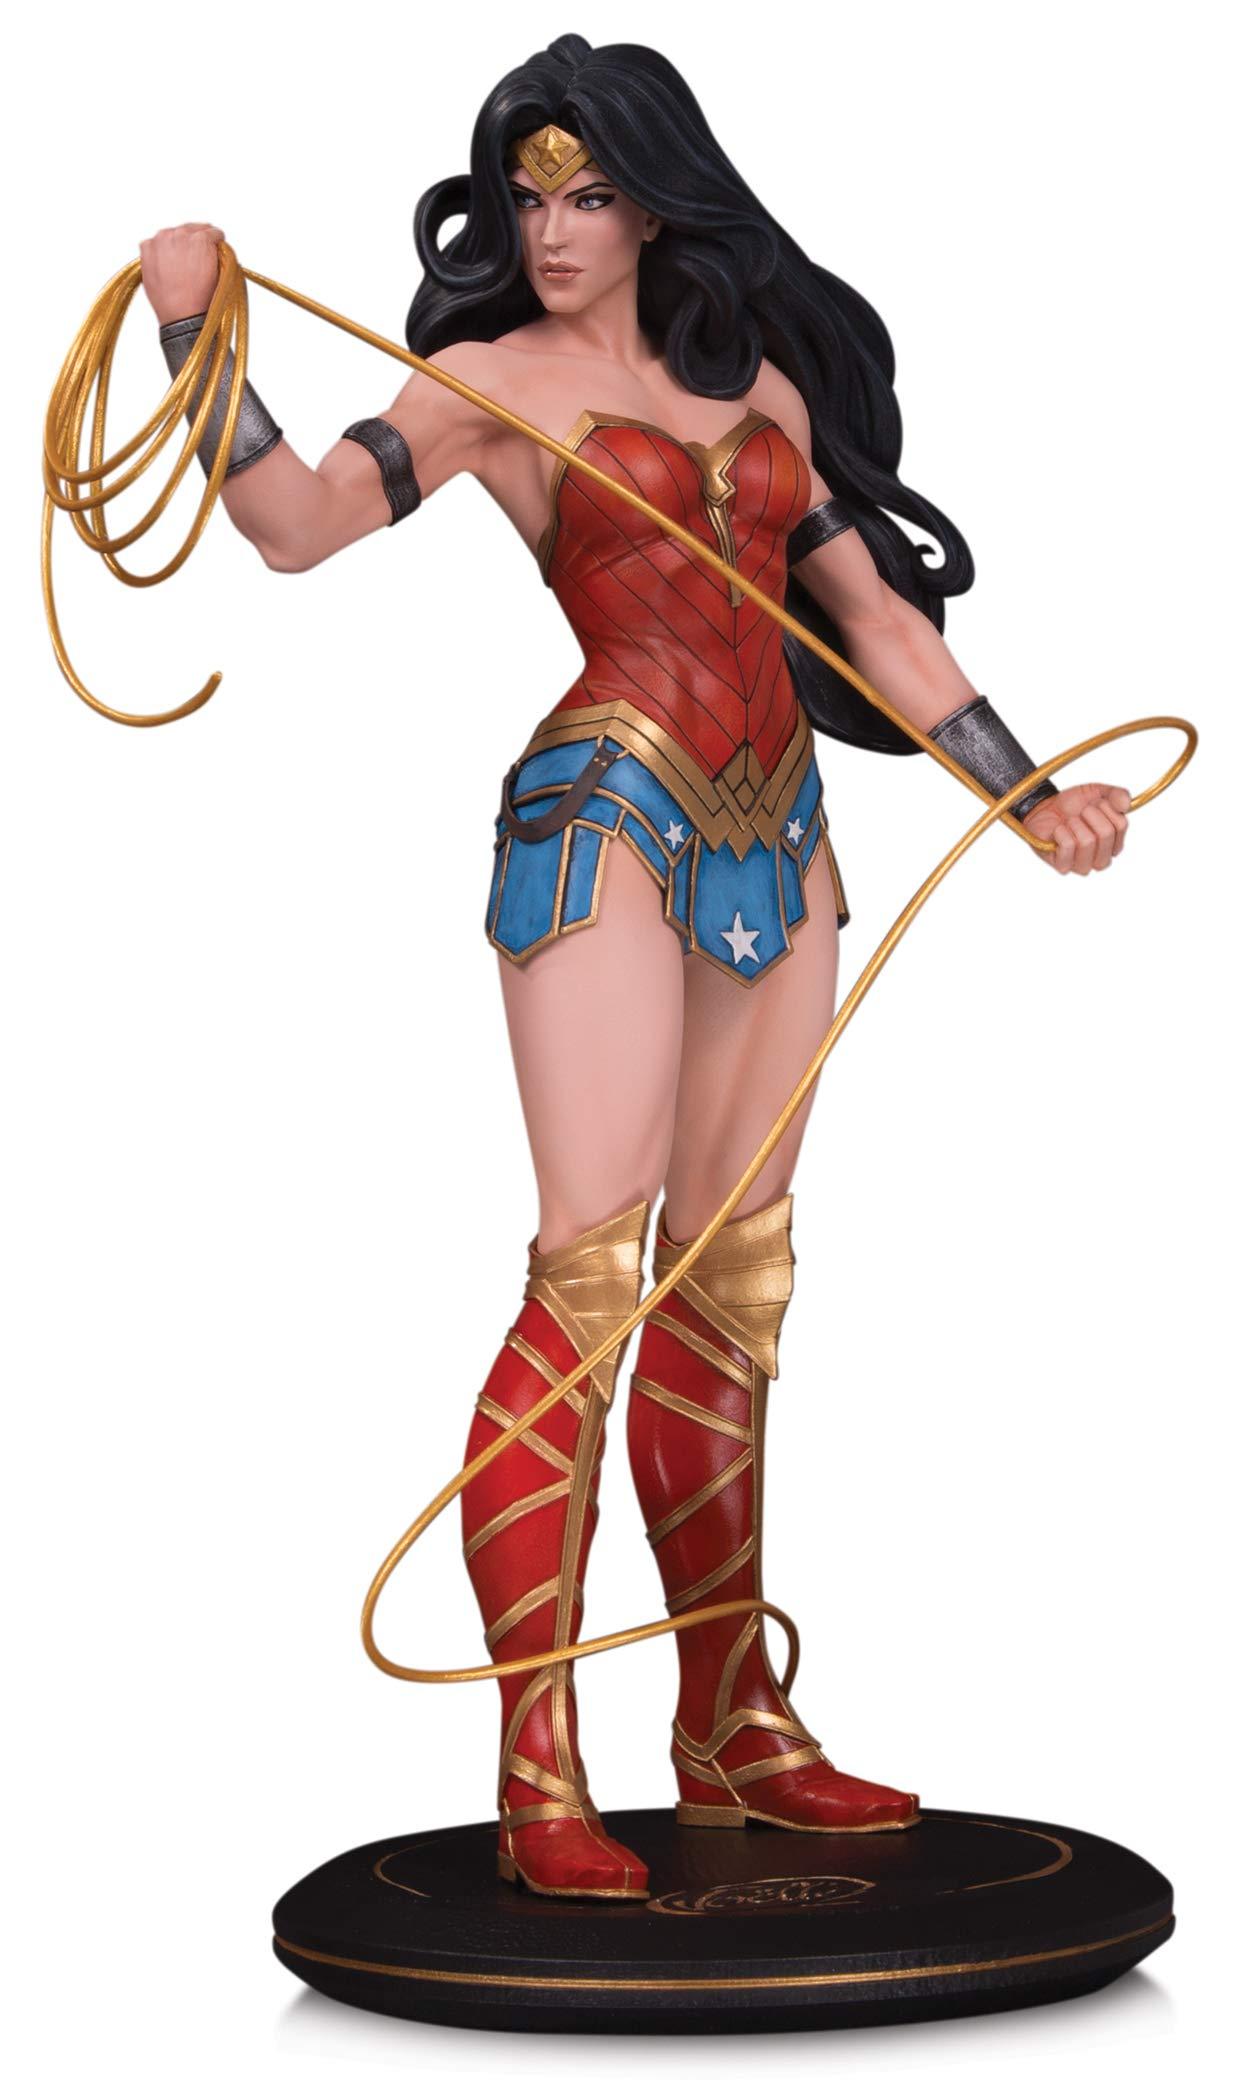 DC Cover Girls: Wonder Woman by Joelle Jones Statue